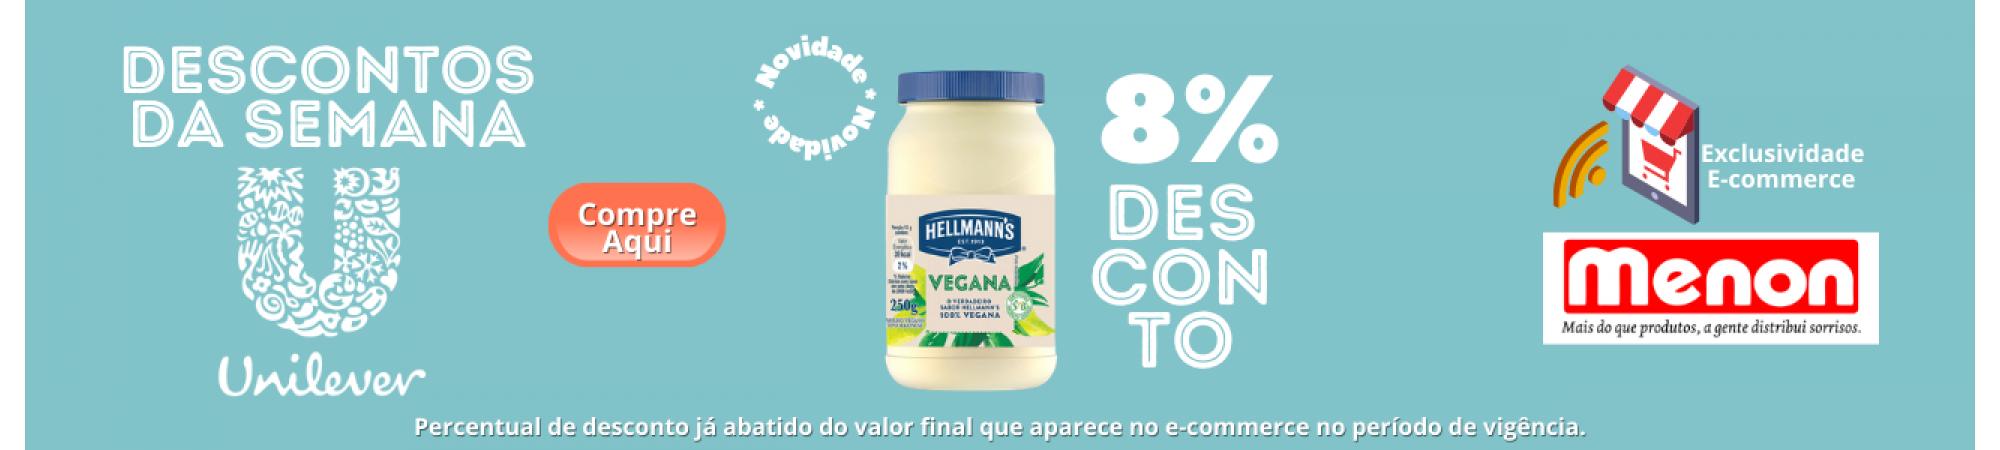 maionese vegana